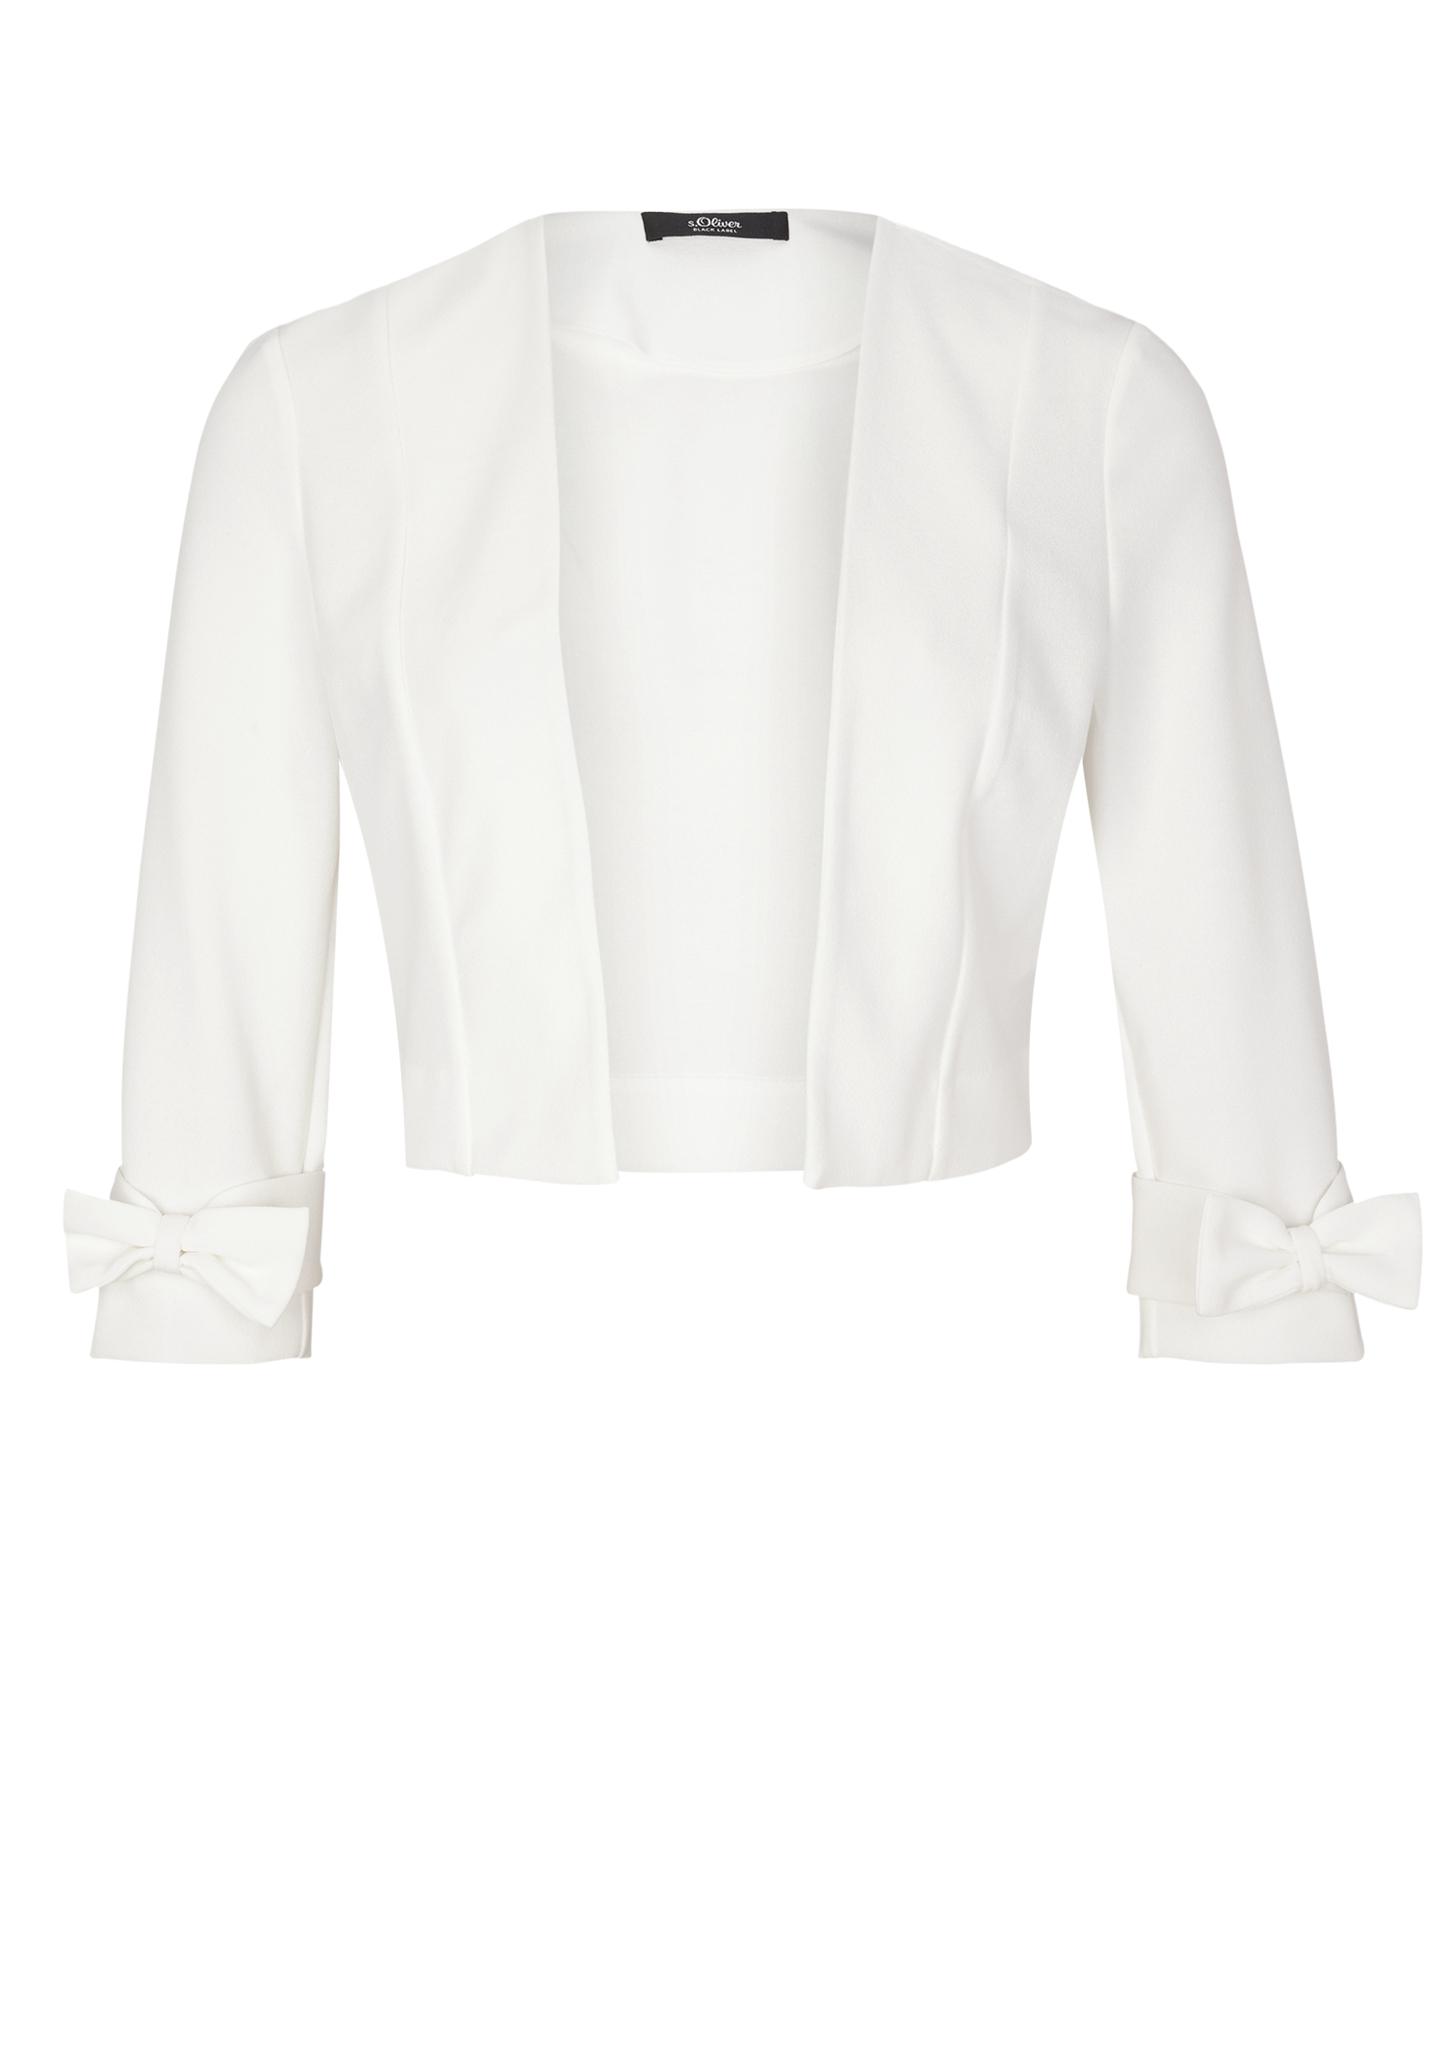 Bolero | Bekleidung > Jacken > Boleros | Weiß | 95% polyester -  5% elasthan | s.Oliver BLACK LABEL